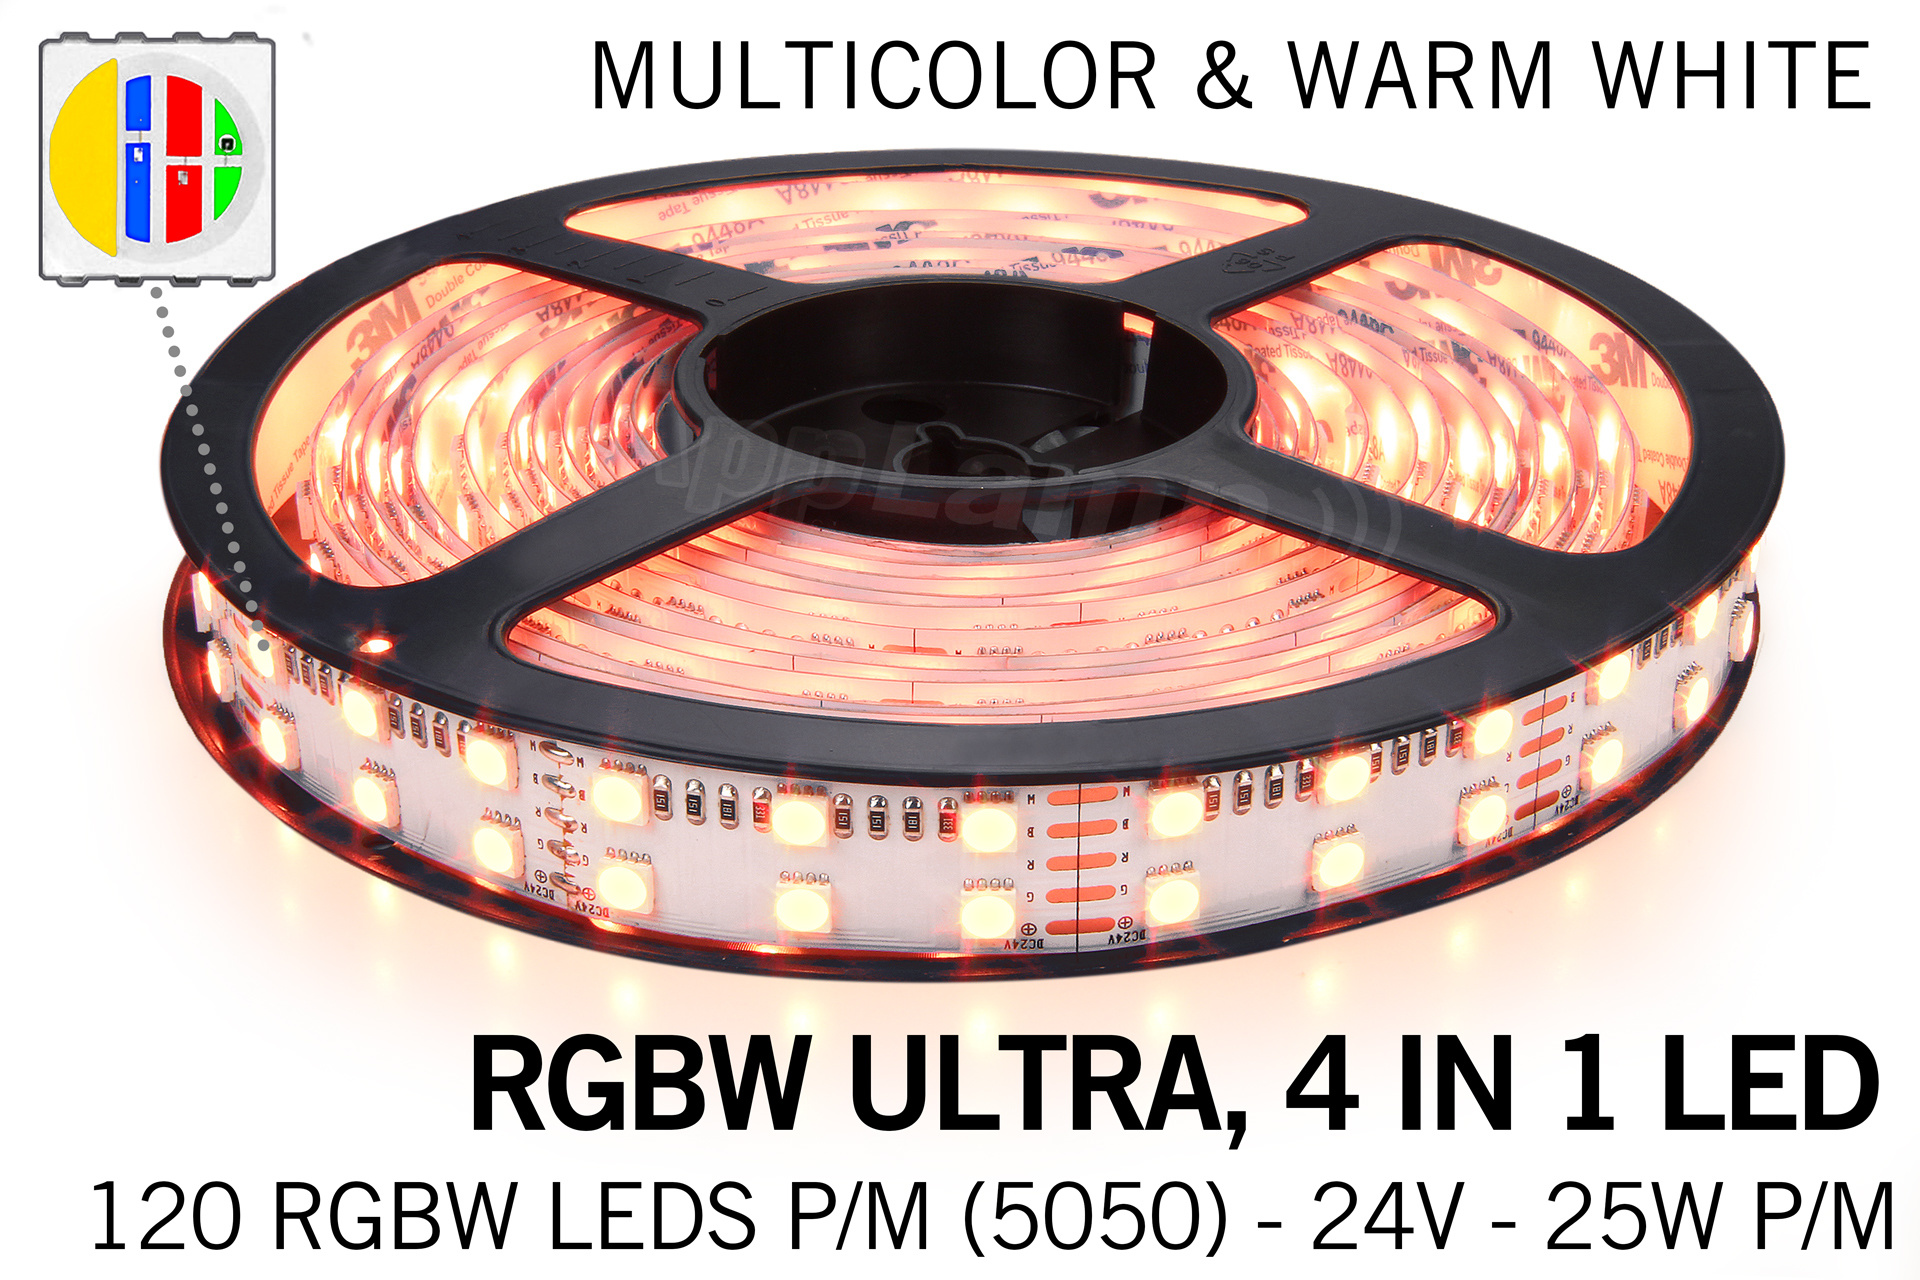 RGB & Warm Wit Ultra 4 in 1 Losse Led Strip | Dubbele rij 120 Leds pm Type 5050 24V 38W pm